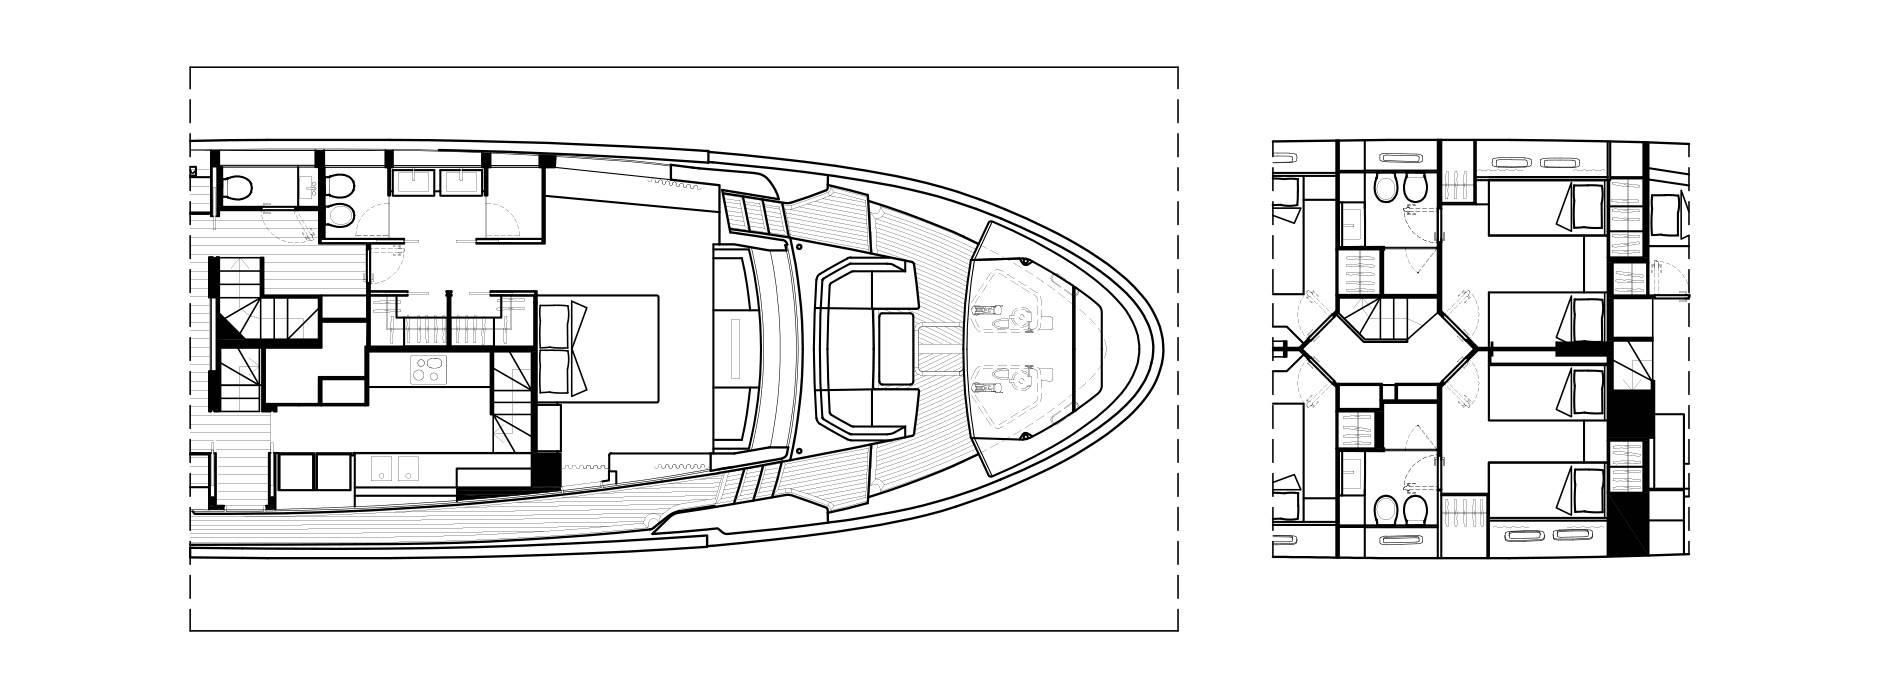 Sanlorenzo Yachts SL102 细节